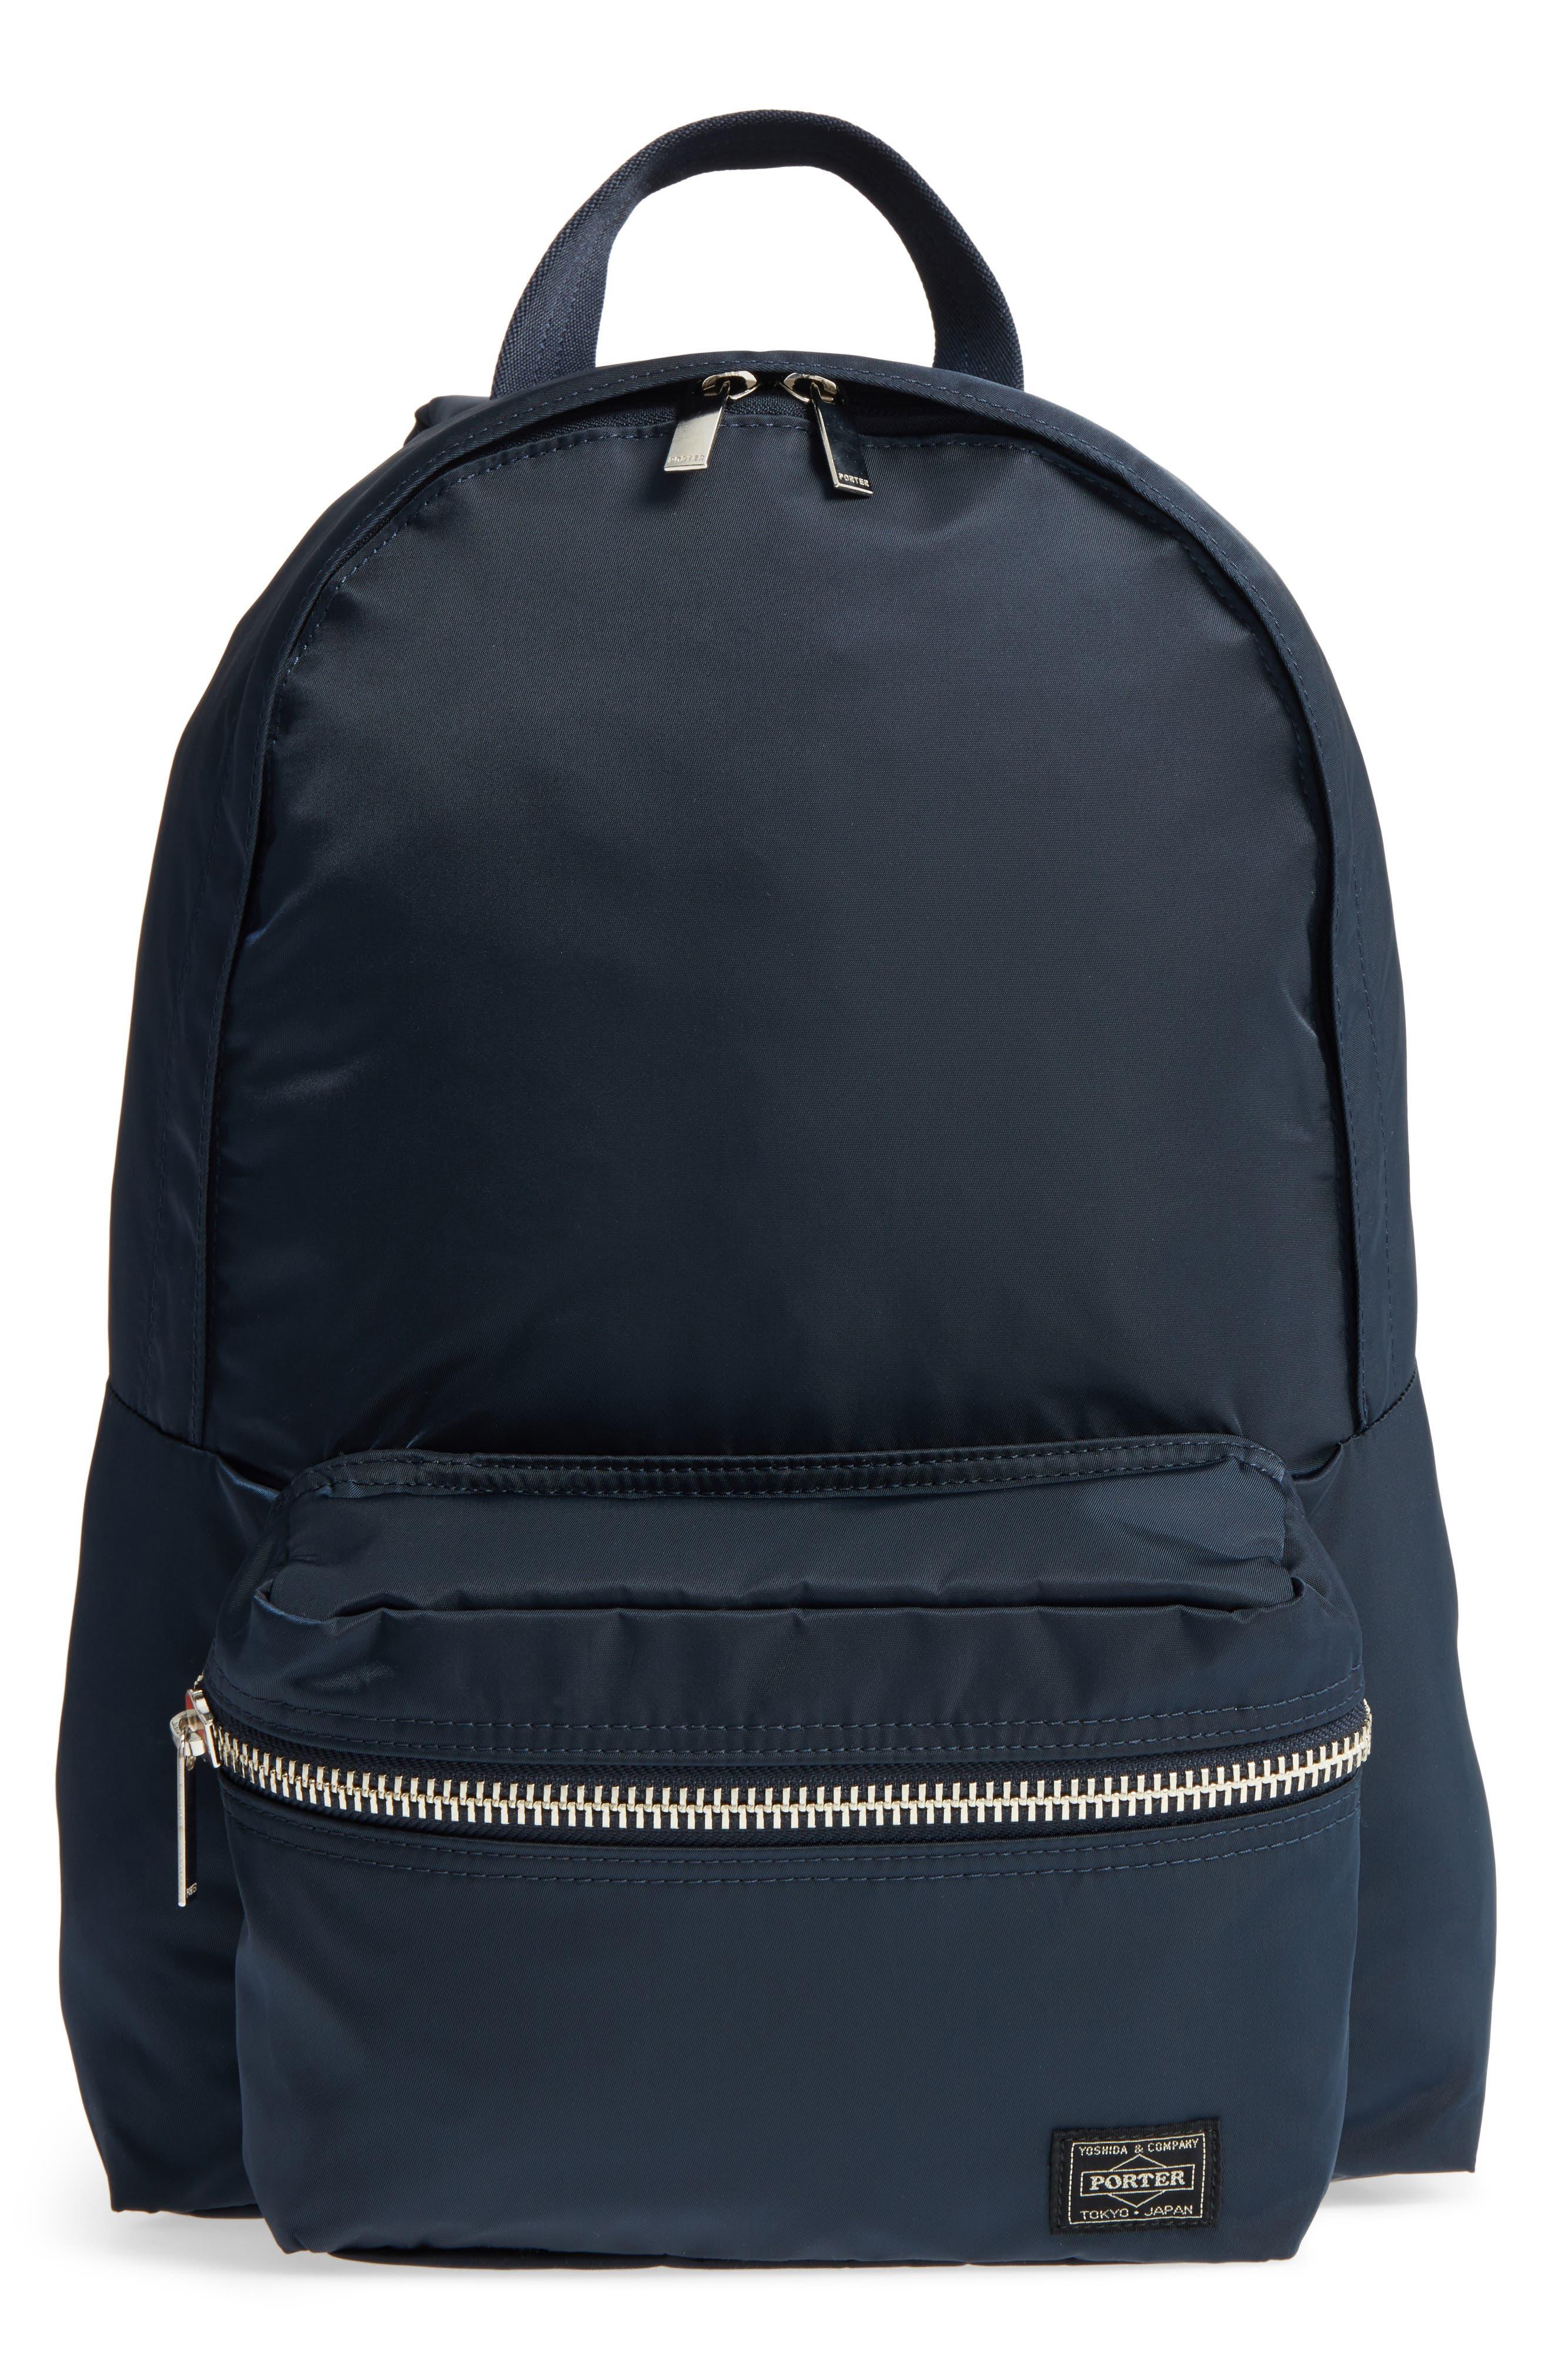 Porter-Yoshida & Co. Daily Backpack,                             Main thumbnail 1, color,                             Navy